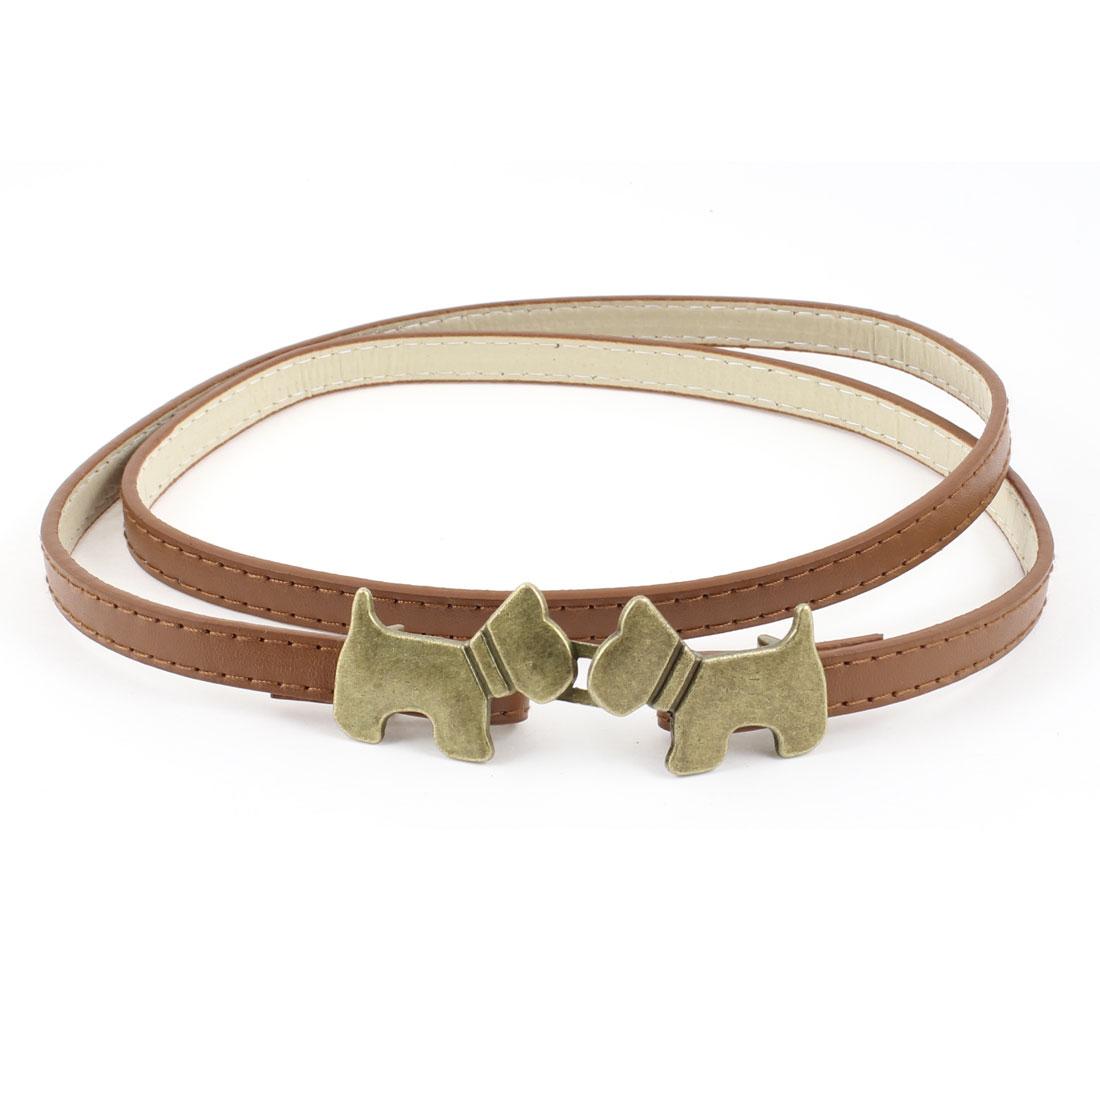 "Ladies Dog Ornament Interlock Buckle 0.39"" Width Faux Leather Belt Brown"